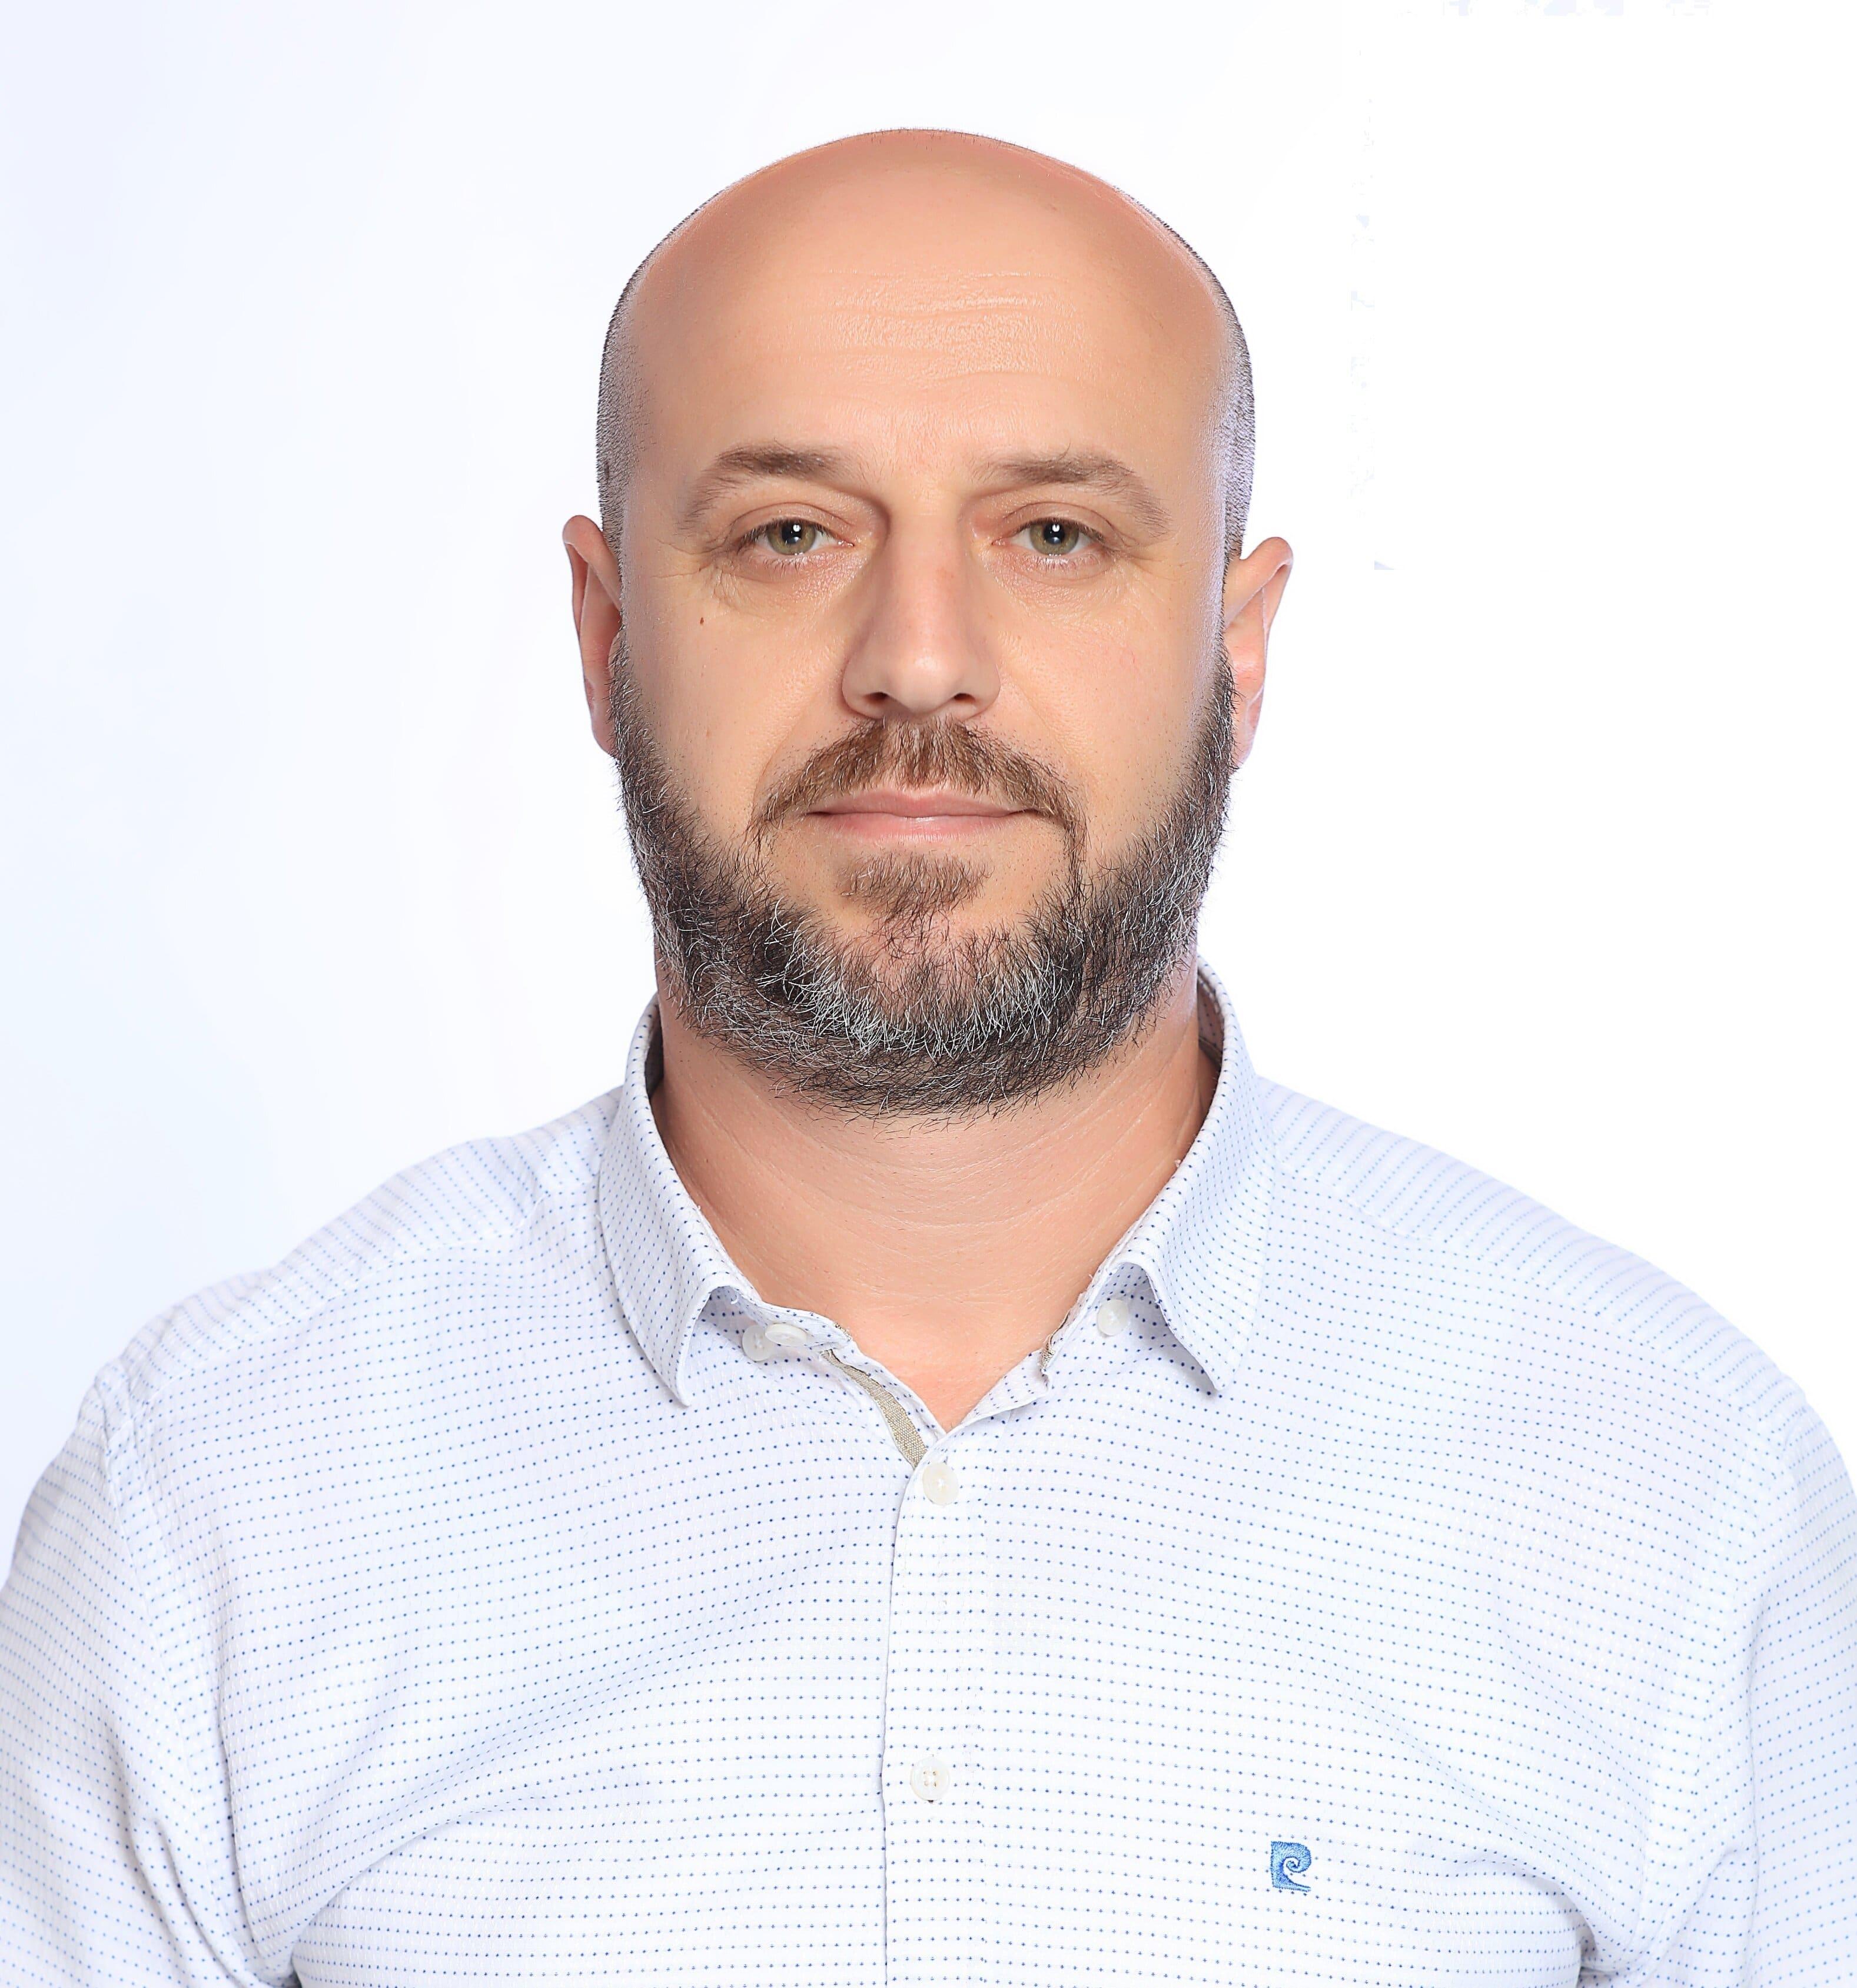 Euglen Mustafallari